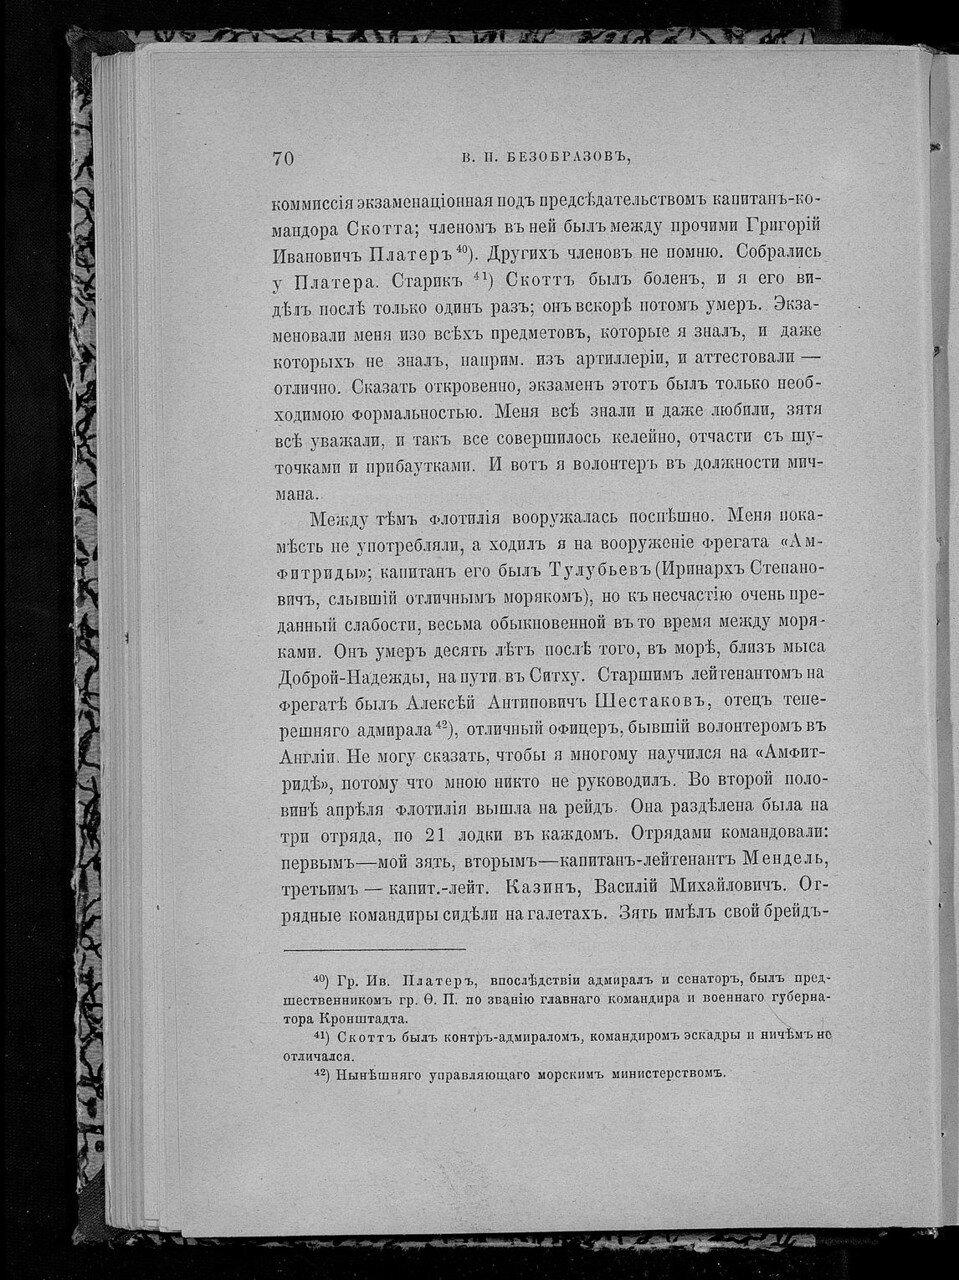 https://img-fotki.yandex.ru/get/893194/199368979.d4/0_21dde3_bc26cc2c_XXXL.jpg